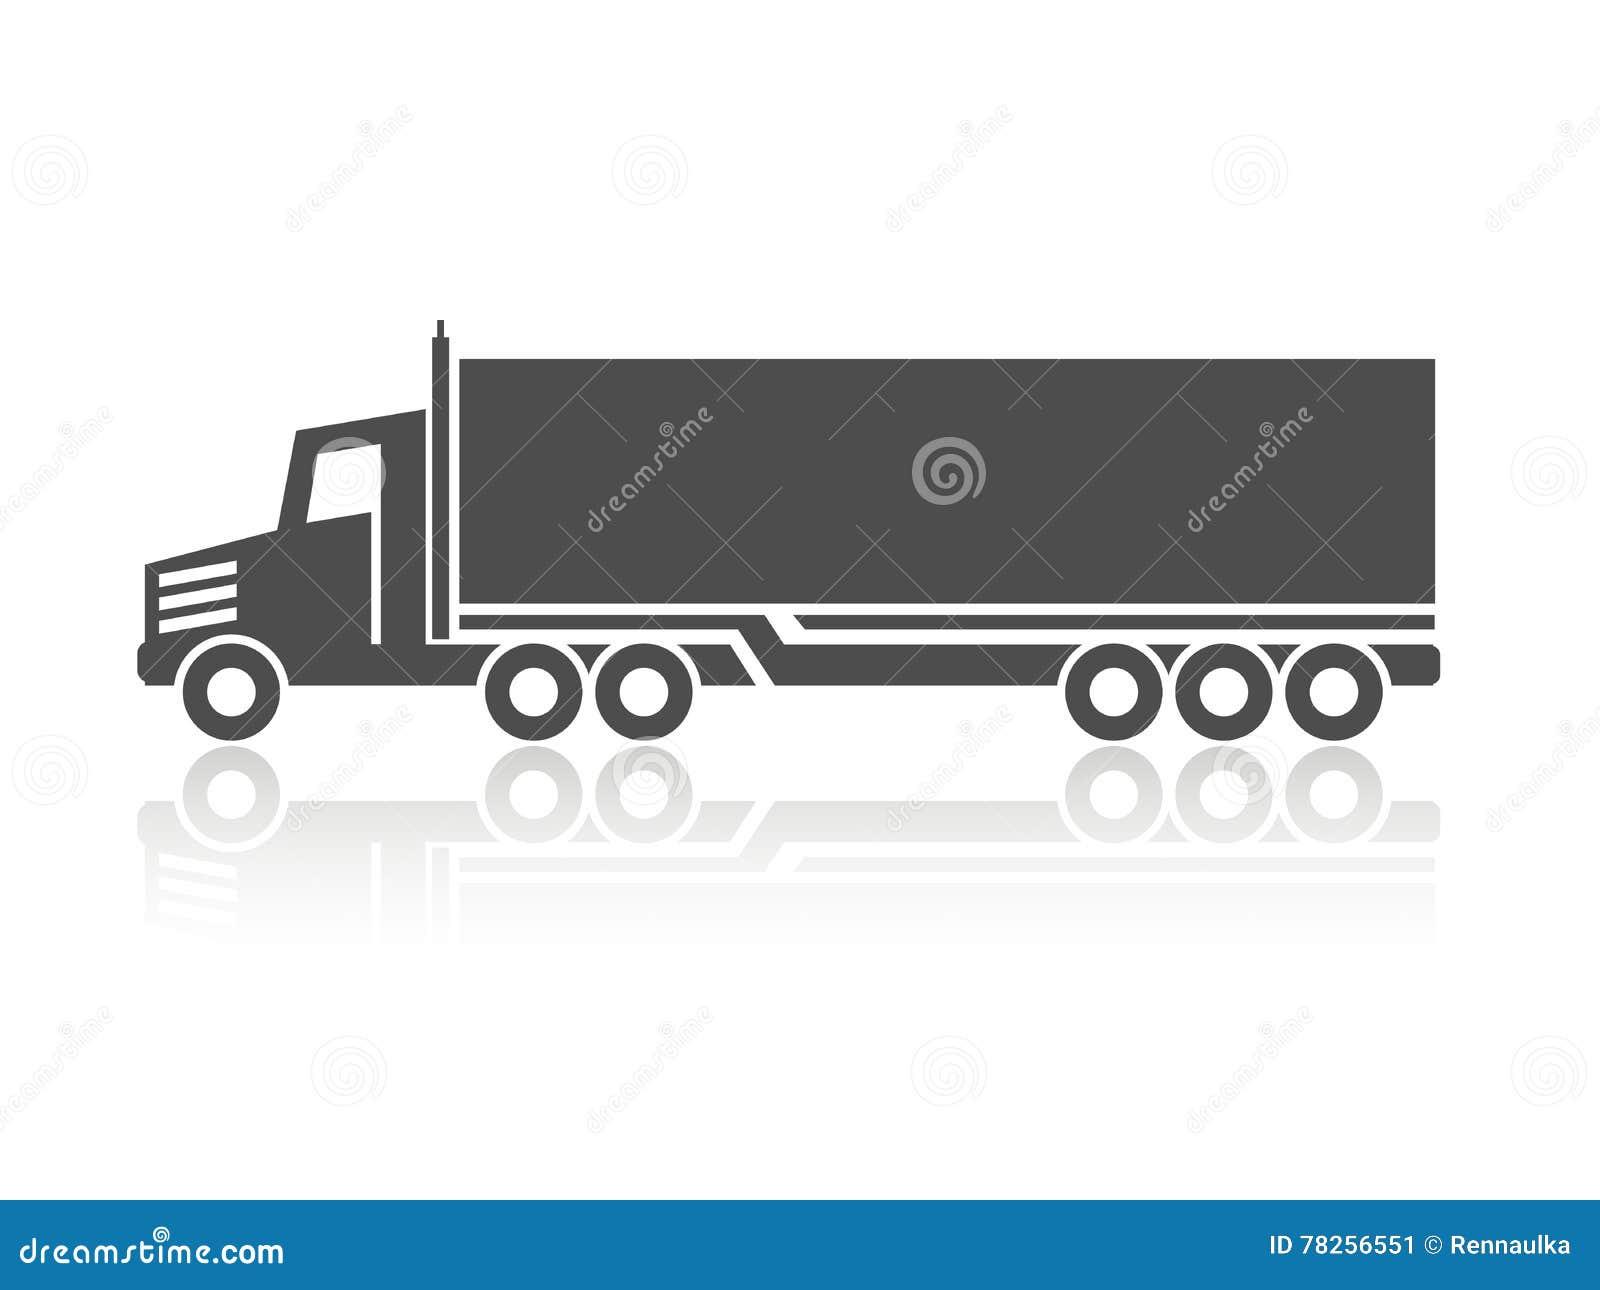 Symbol Of Transport Silhouette Of Truck Lorry Monochrome Design